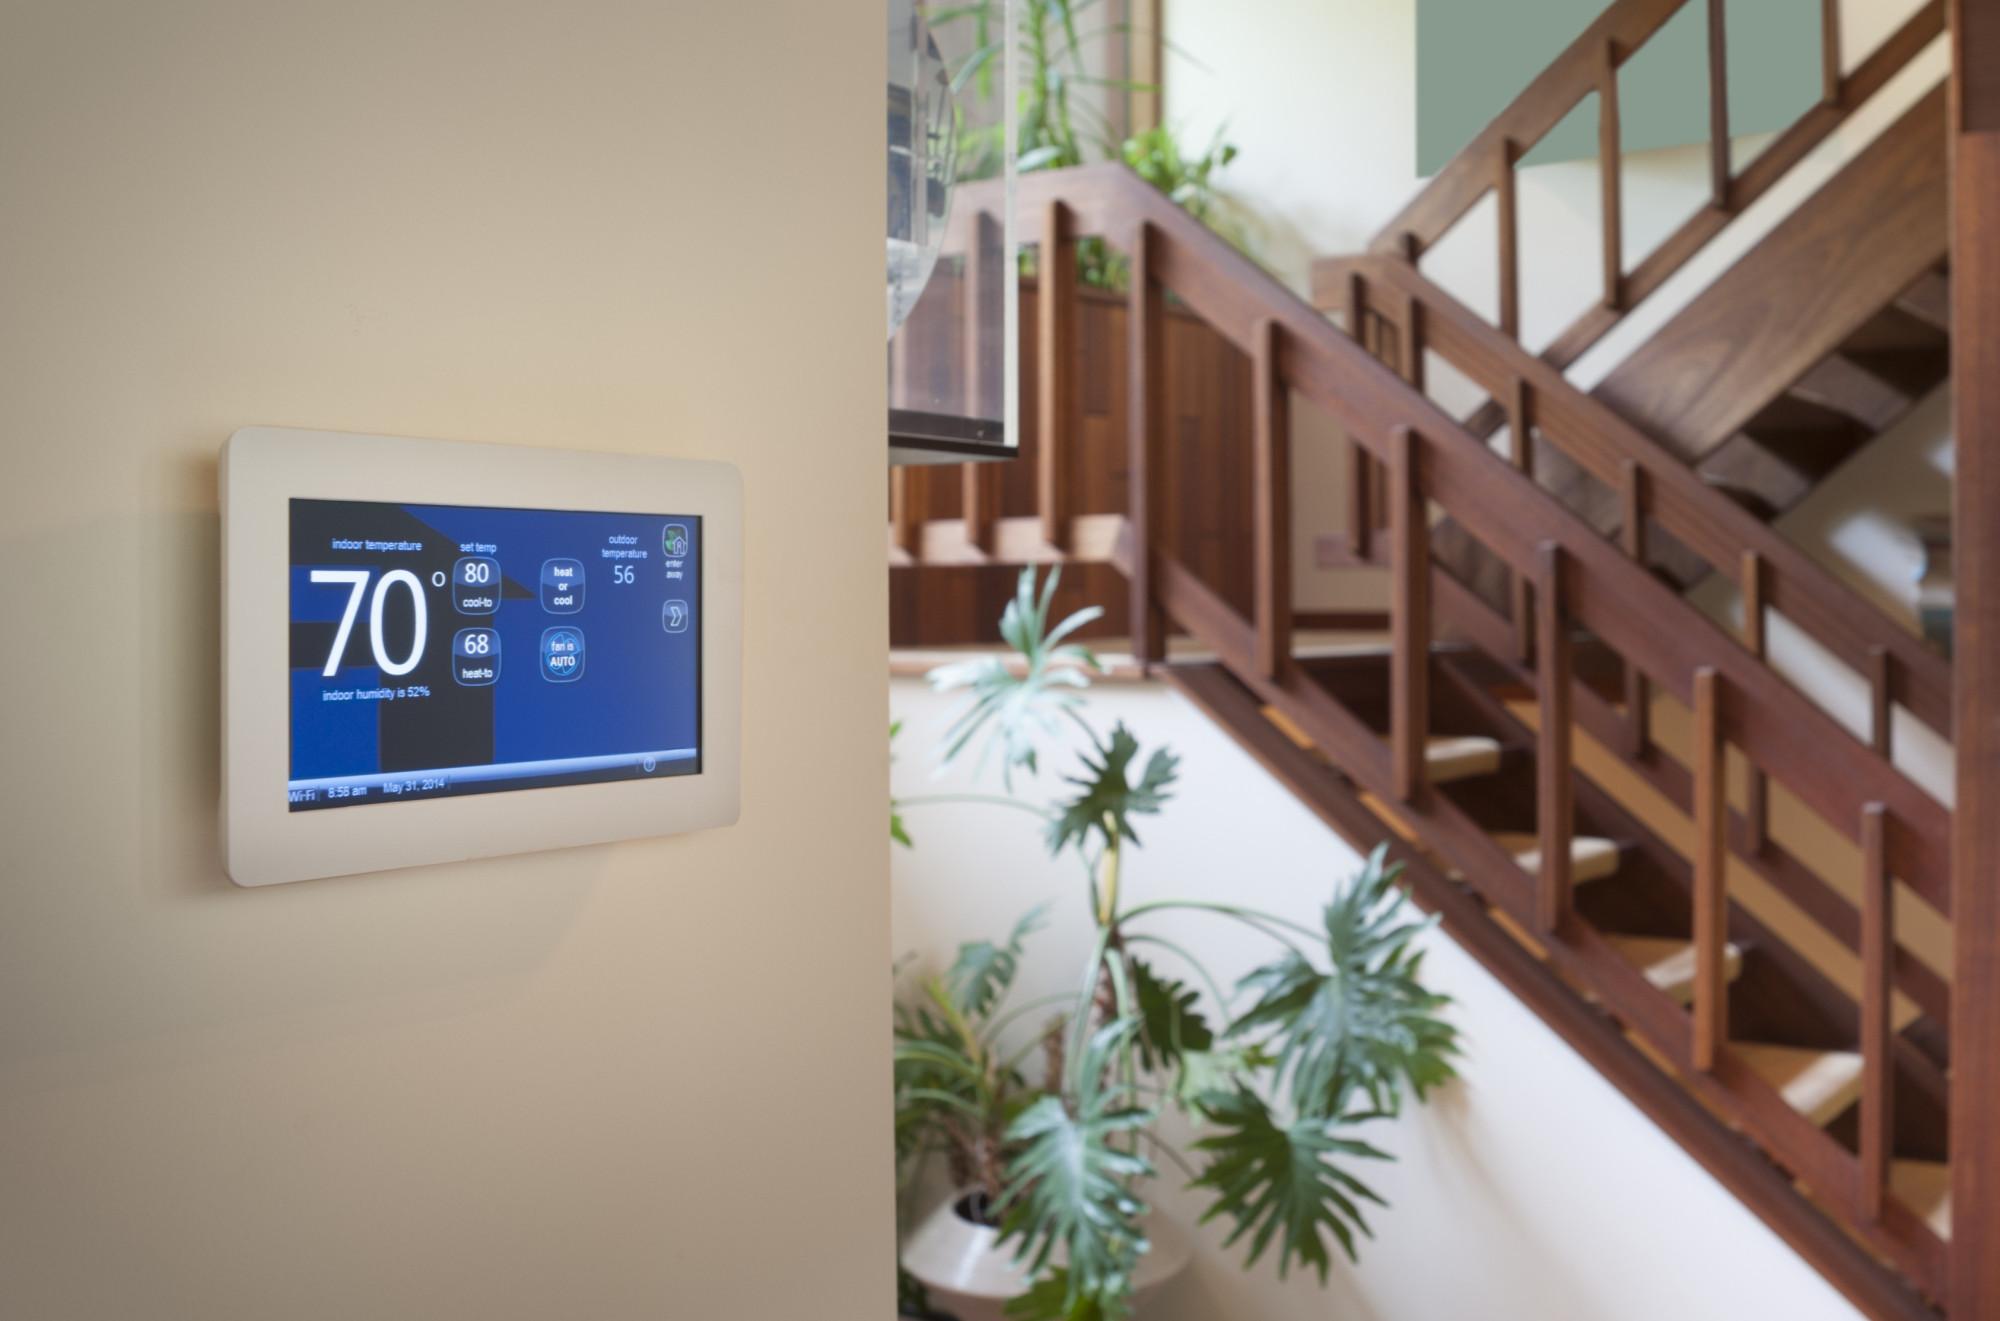 smart home installation services atlanta smart home monitoring atlanta ga. Black Bedroom Furniture Sets. Home Design Ideas